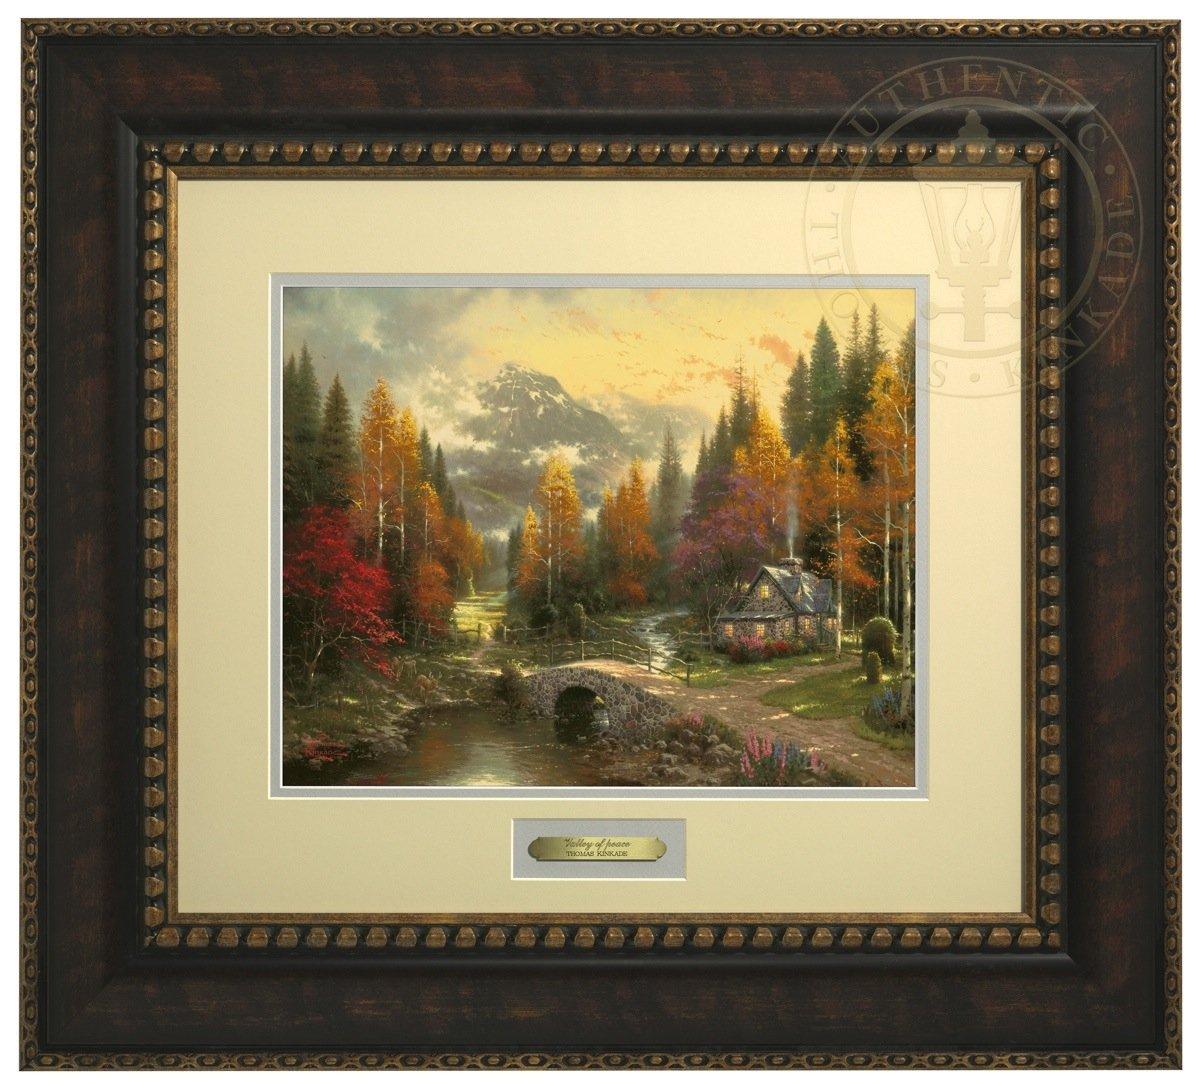 The Valley of Peace - Thomas Kinkade Prestige Home Collection (Bronze Frame) by Thomas Kinkade